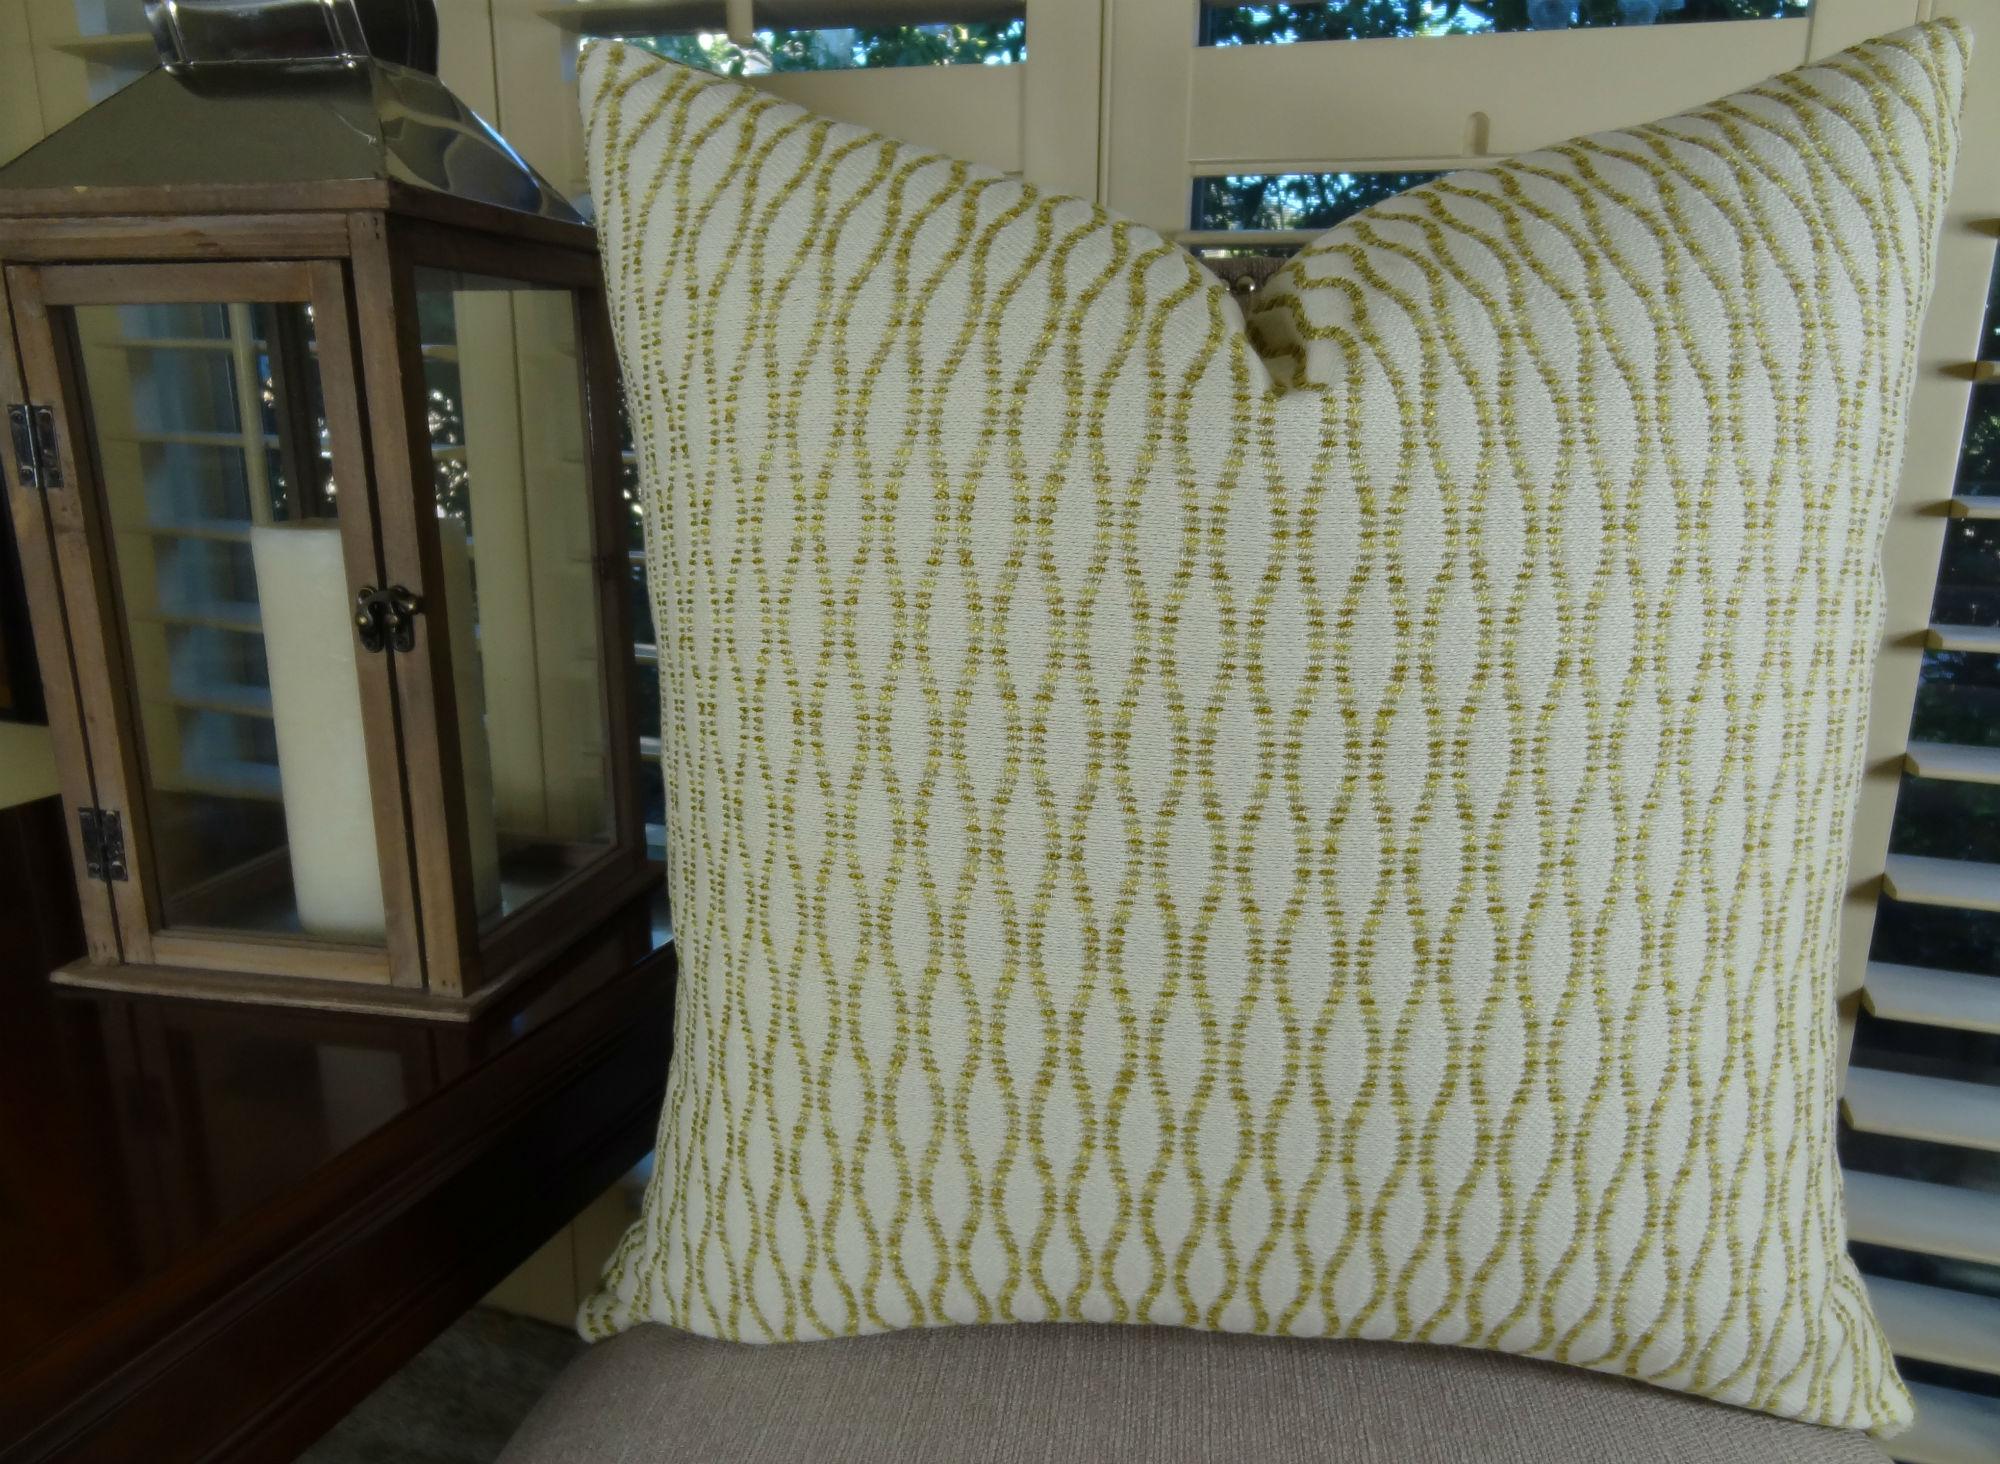 22 x 22 luxury designer decorative throw pillow light for Luxury decorative throw pillows